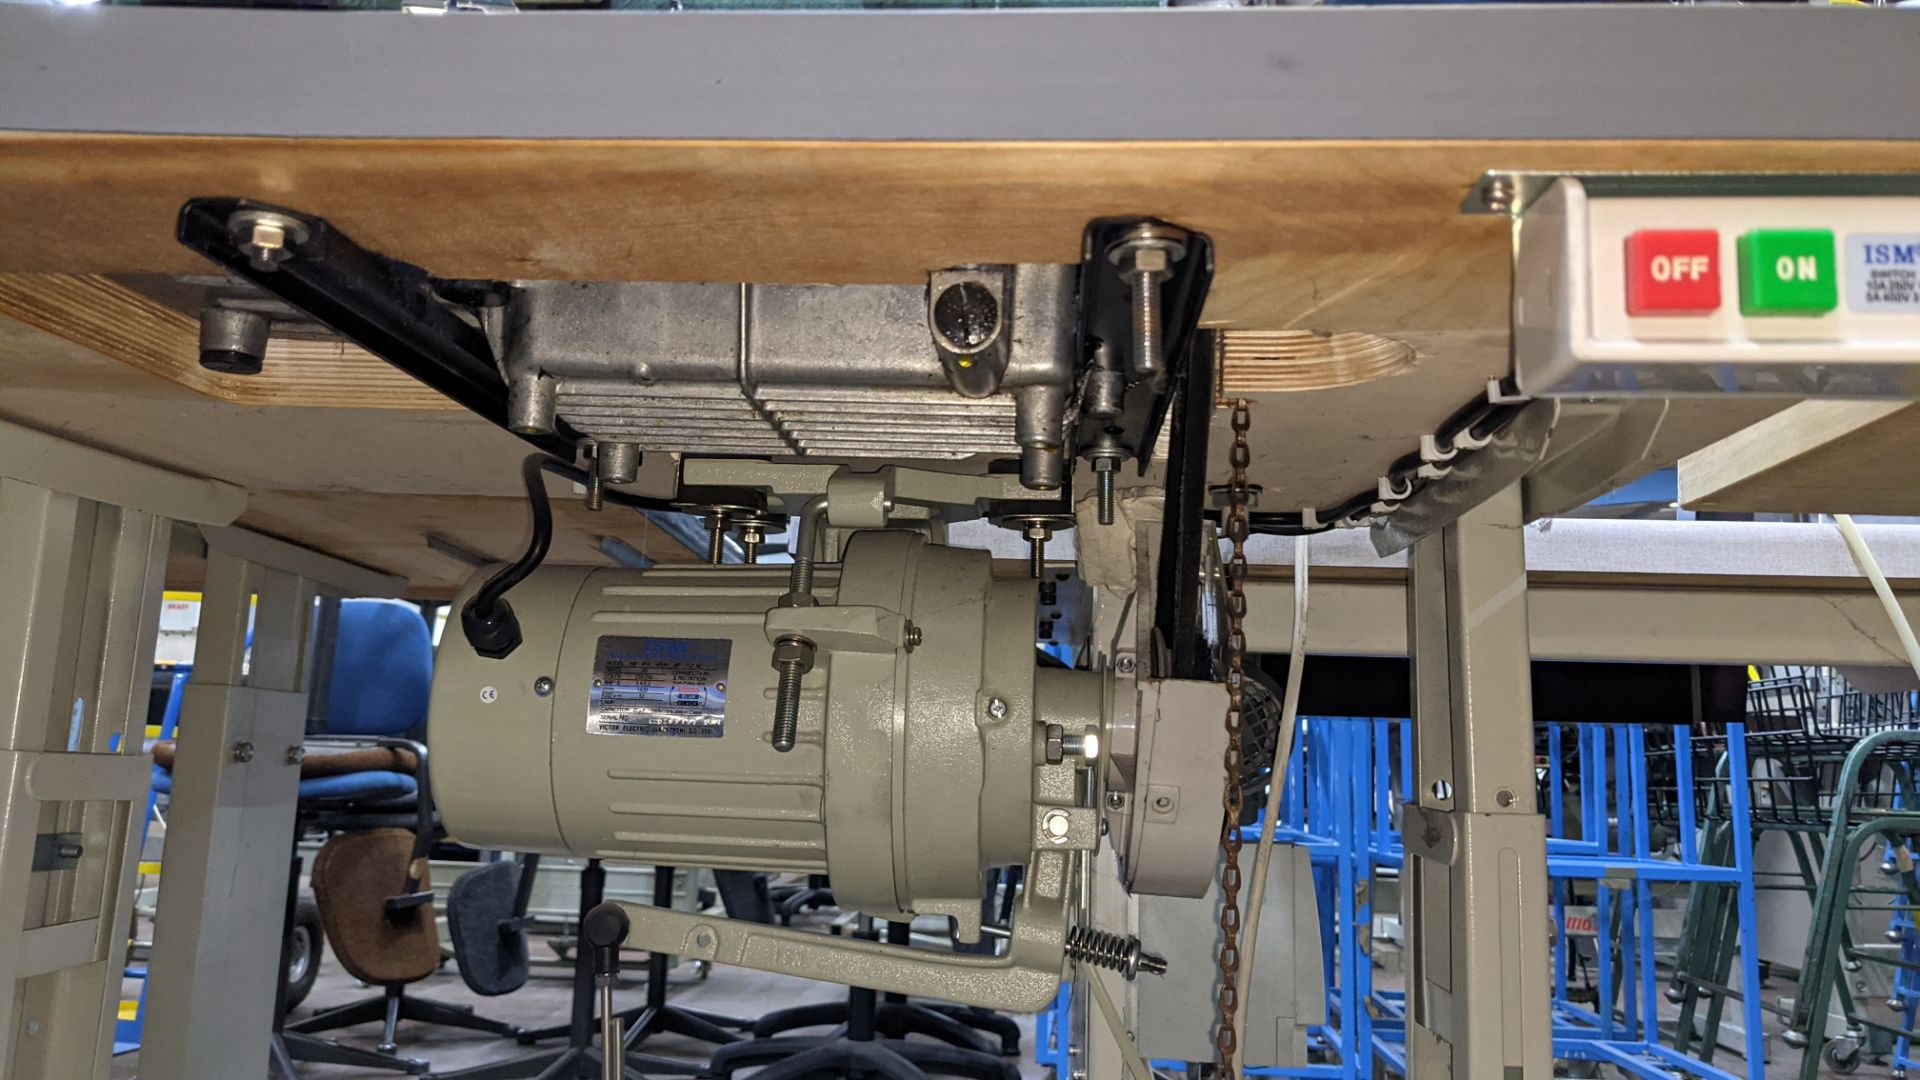 Sewing machine - Image 13 of 16